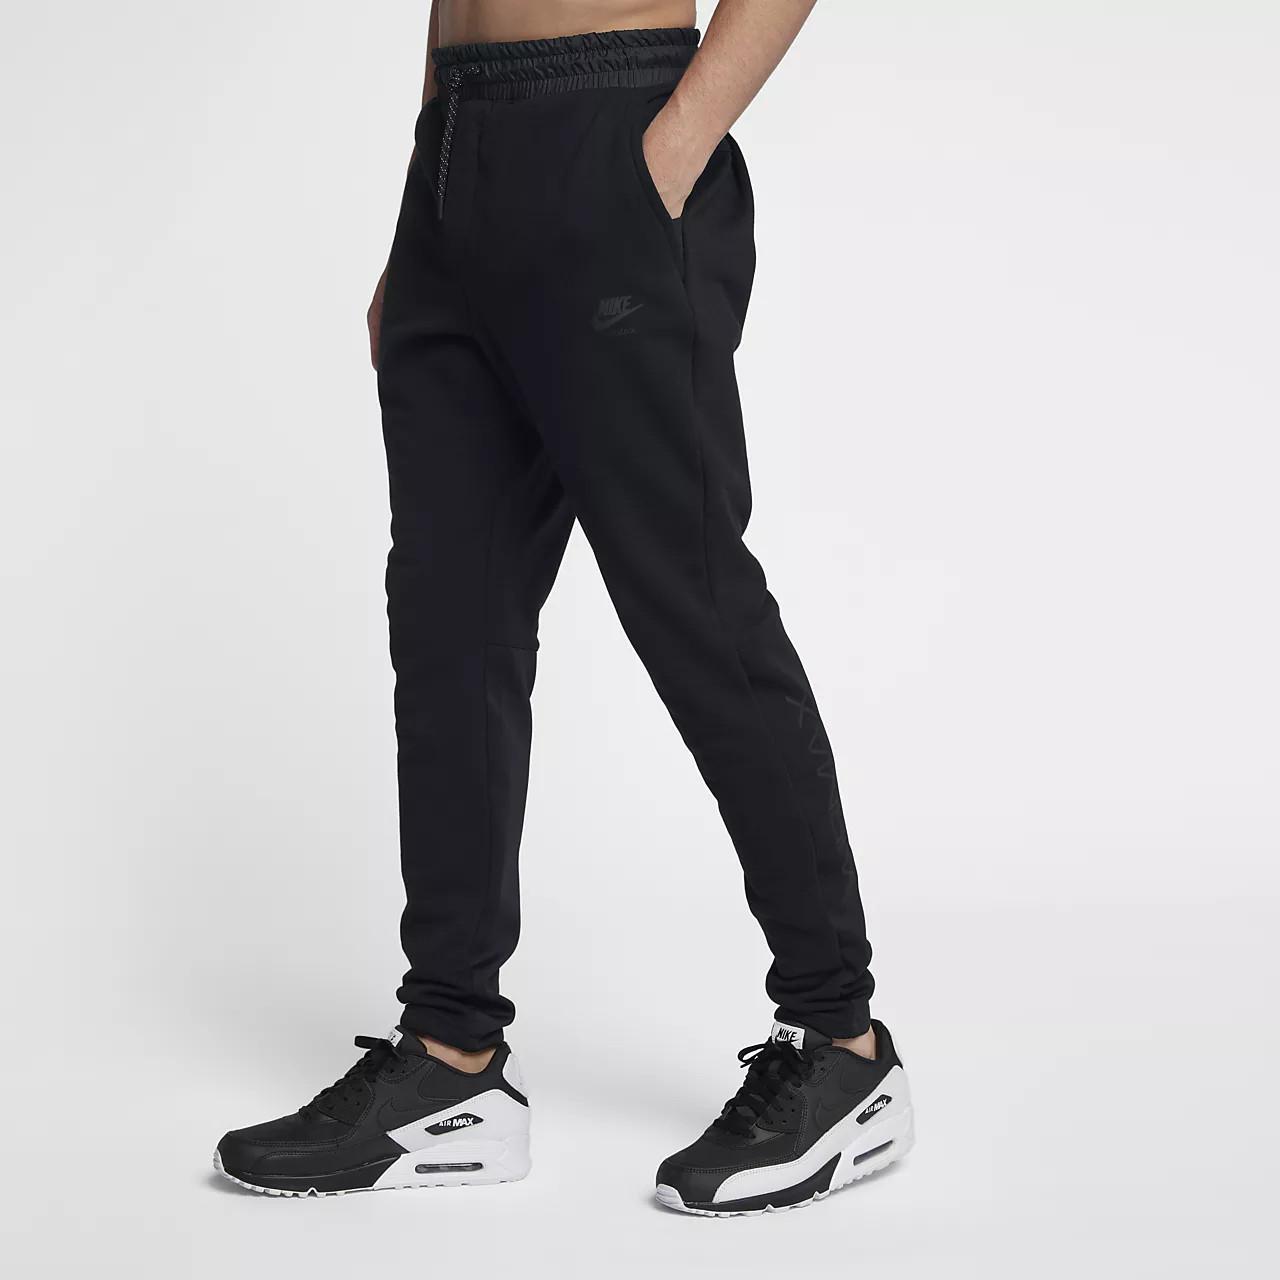 d087f71f Штаны Nike Sportswear Air Max Joggers 886077-010 (Оригинал) - Football Mall  -